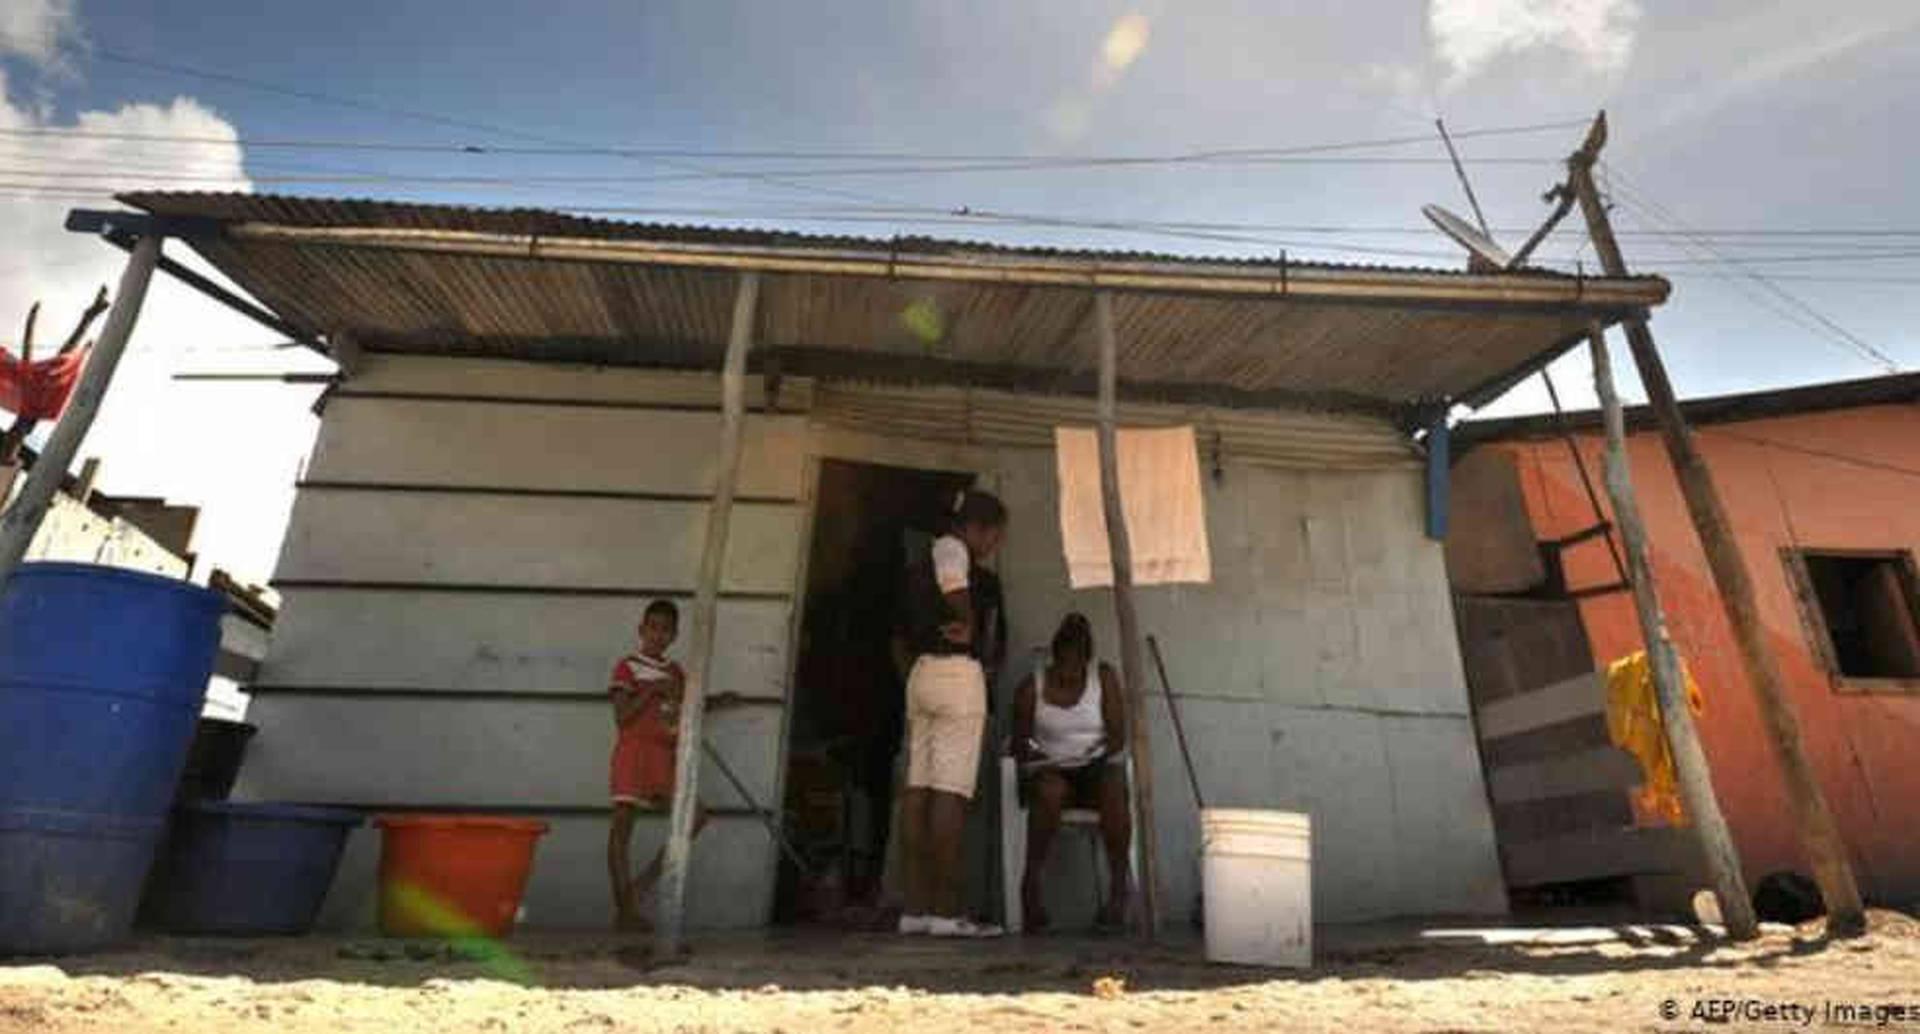 Pobreza en América Latina. Foto: Dw.